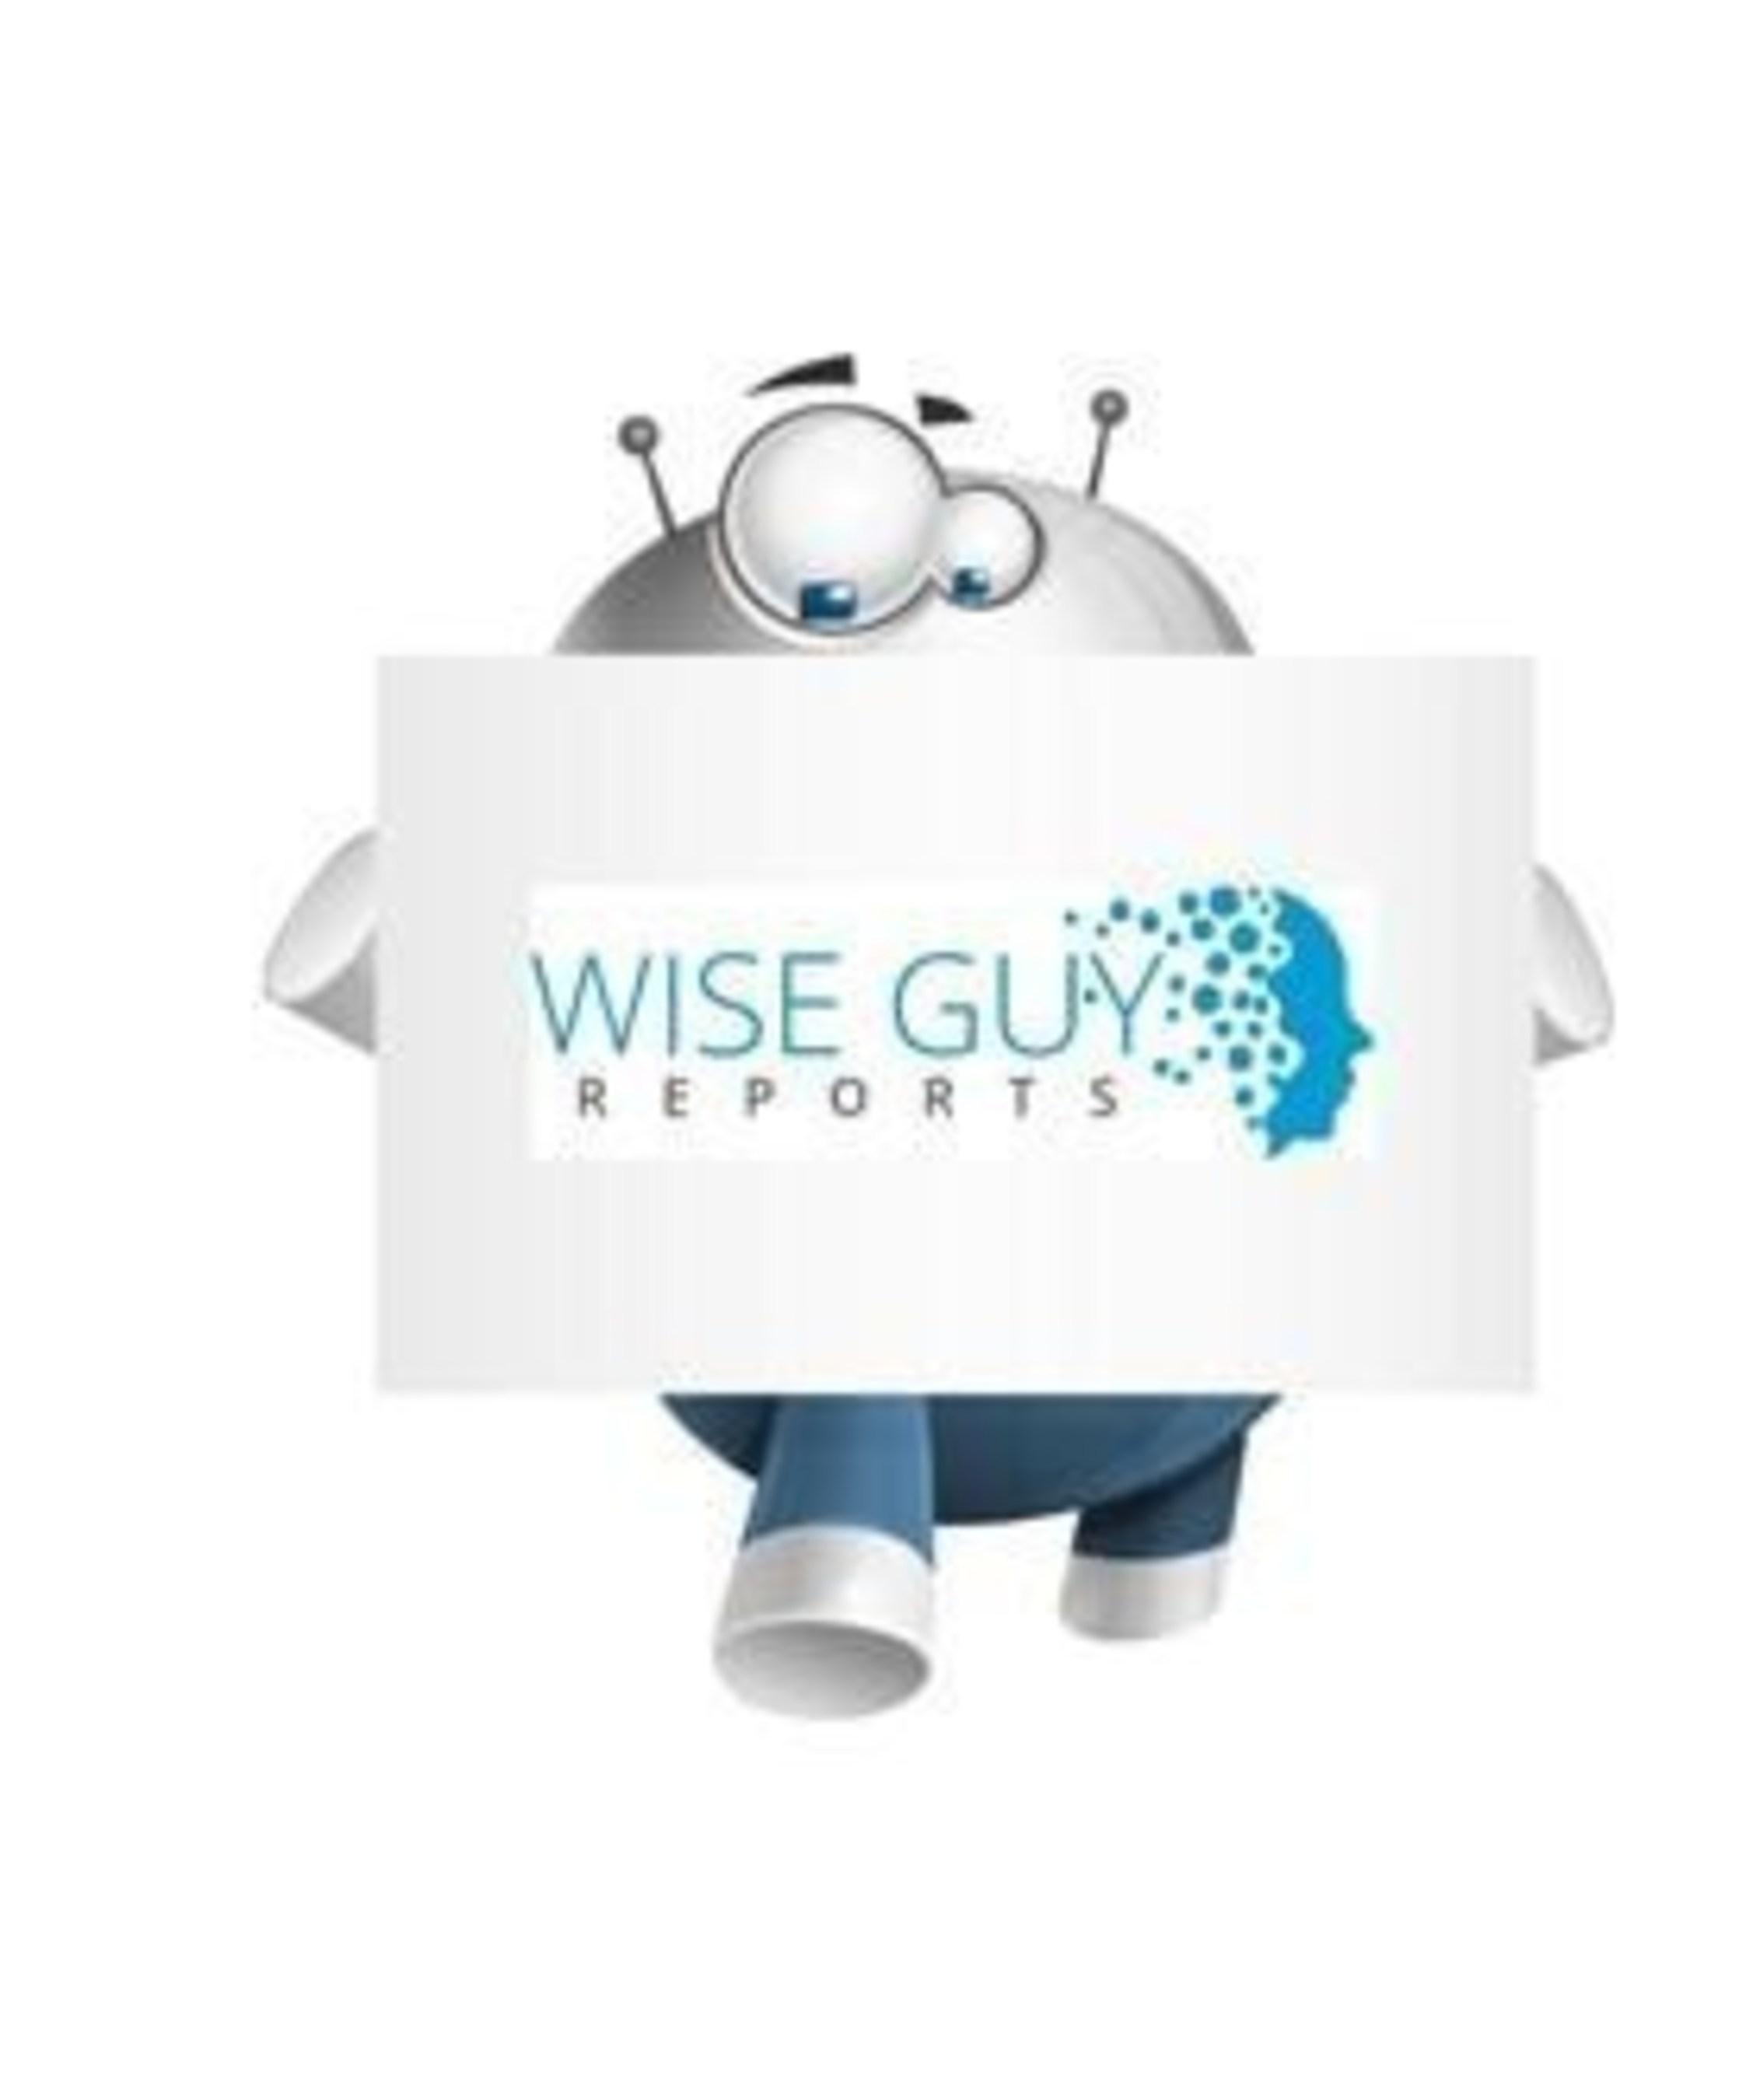 Private Cloud Server Global Market Professional Survey Report 2016